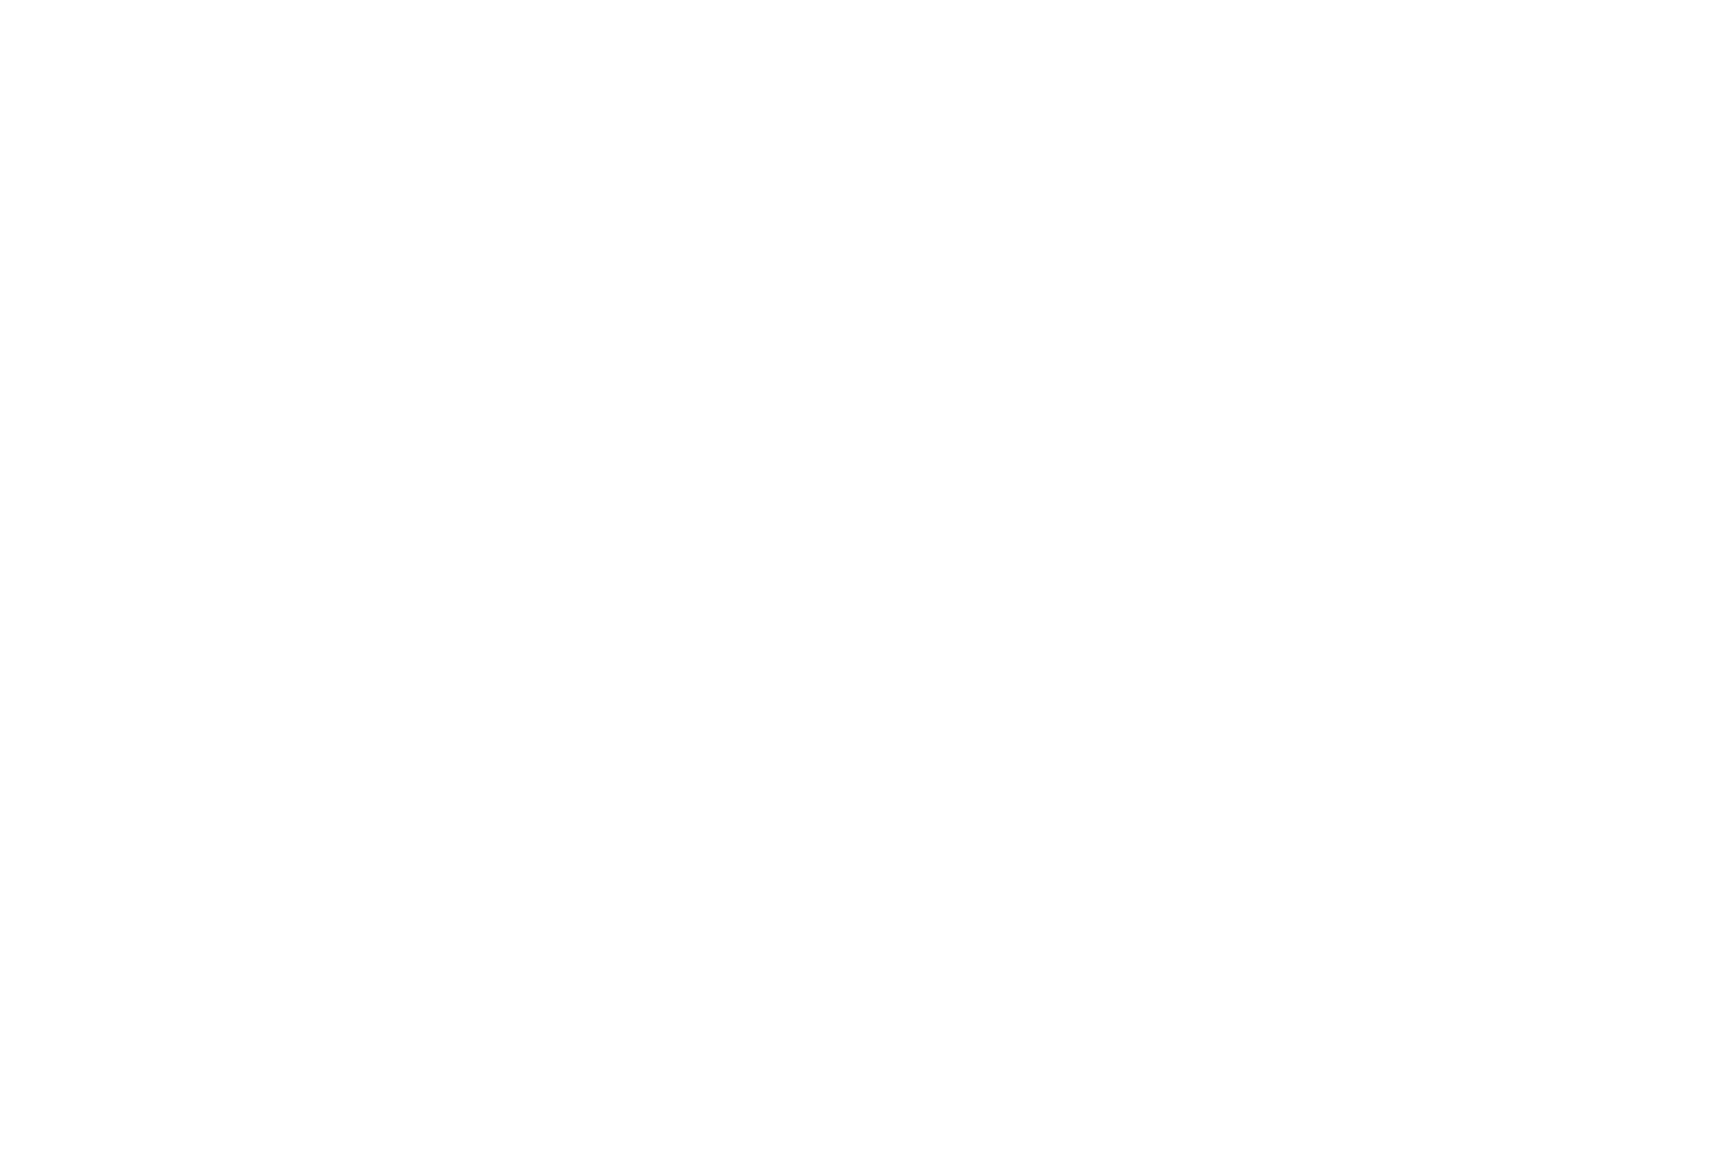 OFFICIAL-SELECTION-INTERNATIONAL-NEW-YORK-FILM-FESTIVAL-2020